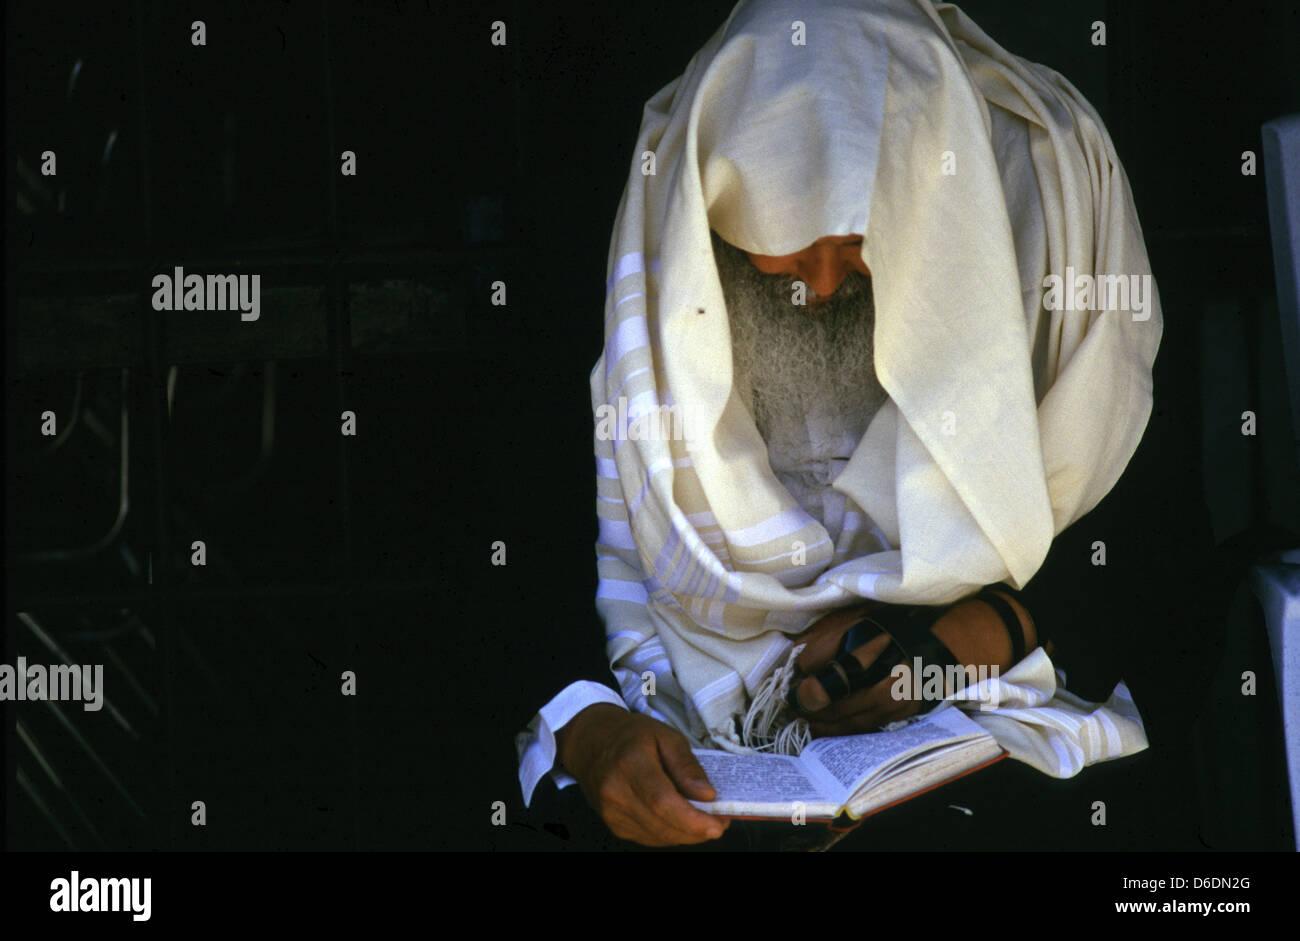 Orthodox Jewish man wrapped with a tfilin and talit prayer shawl reading the Siddur Jewish book of pray - Stock Image